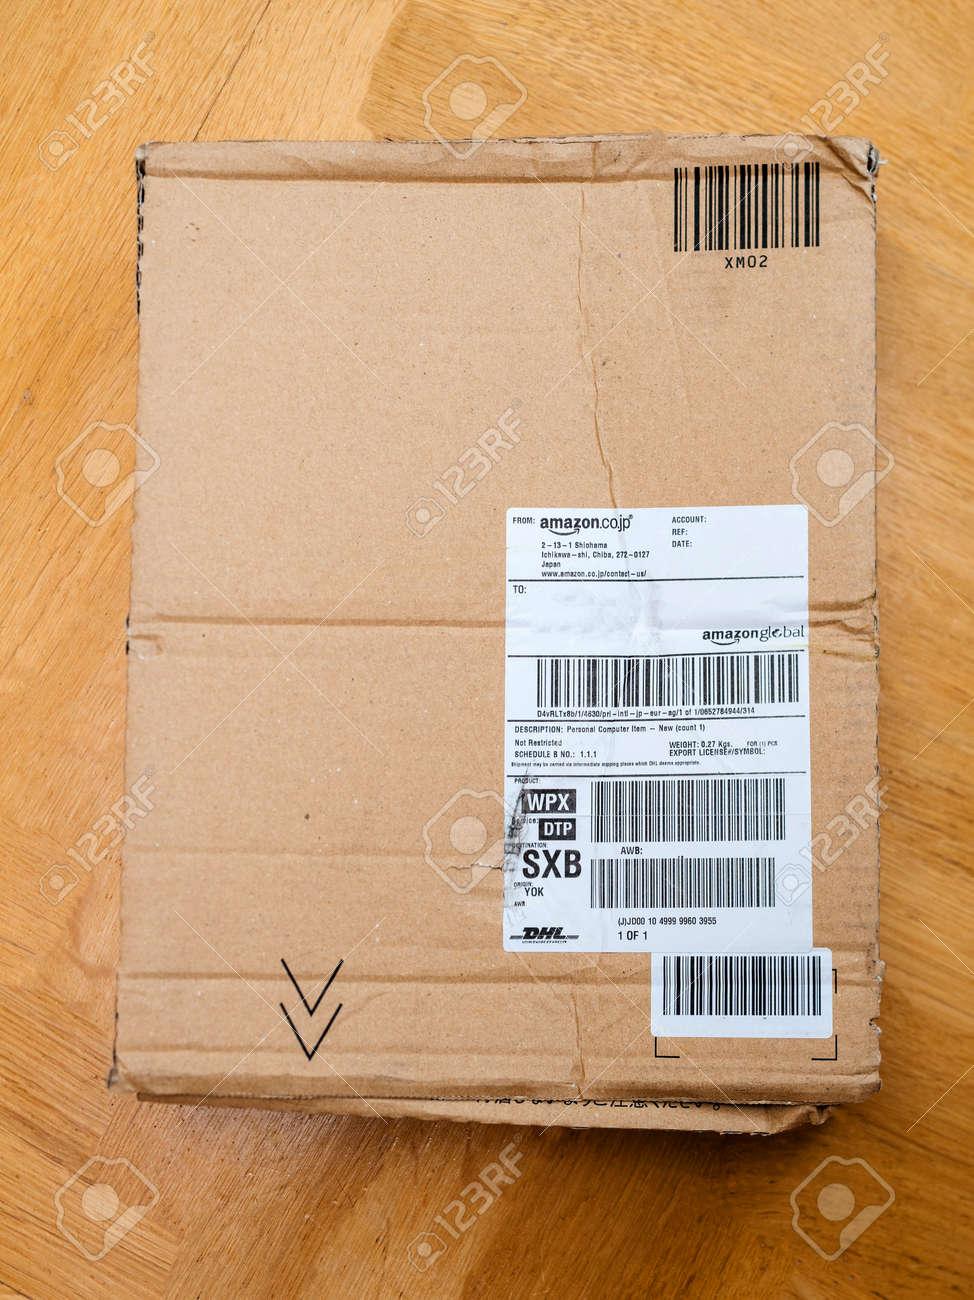 PARIS, FRANCE - APR 9, 2017: Cardboard box from Amazon co jp